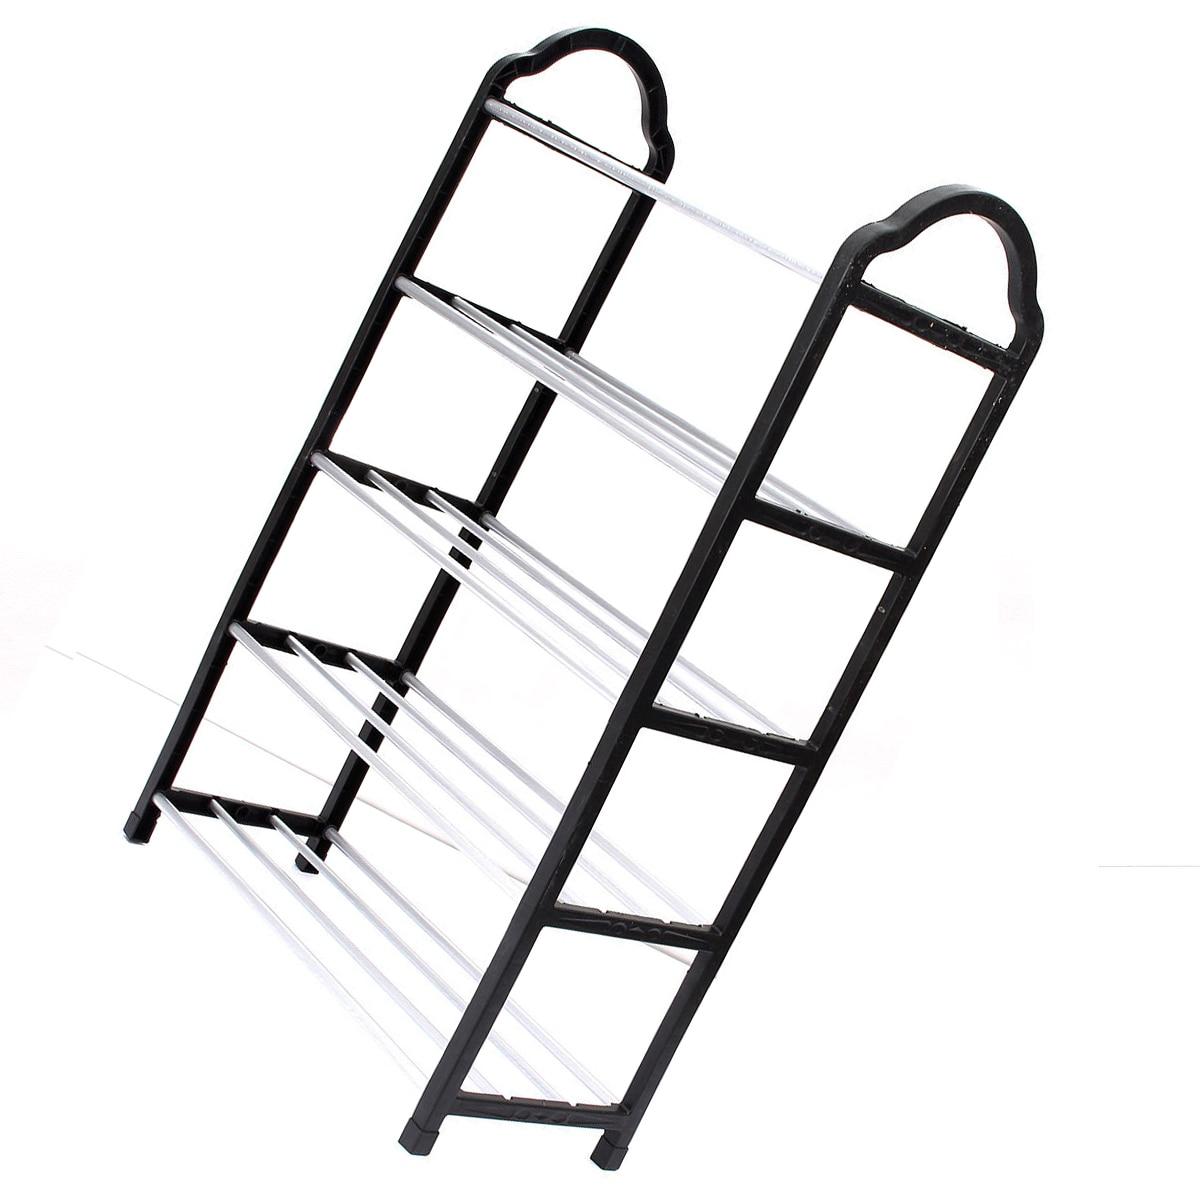 5 Tier Home Storage Organizer Cabinet Shelf Space Saving Shoe Tower Rack Stand Black